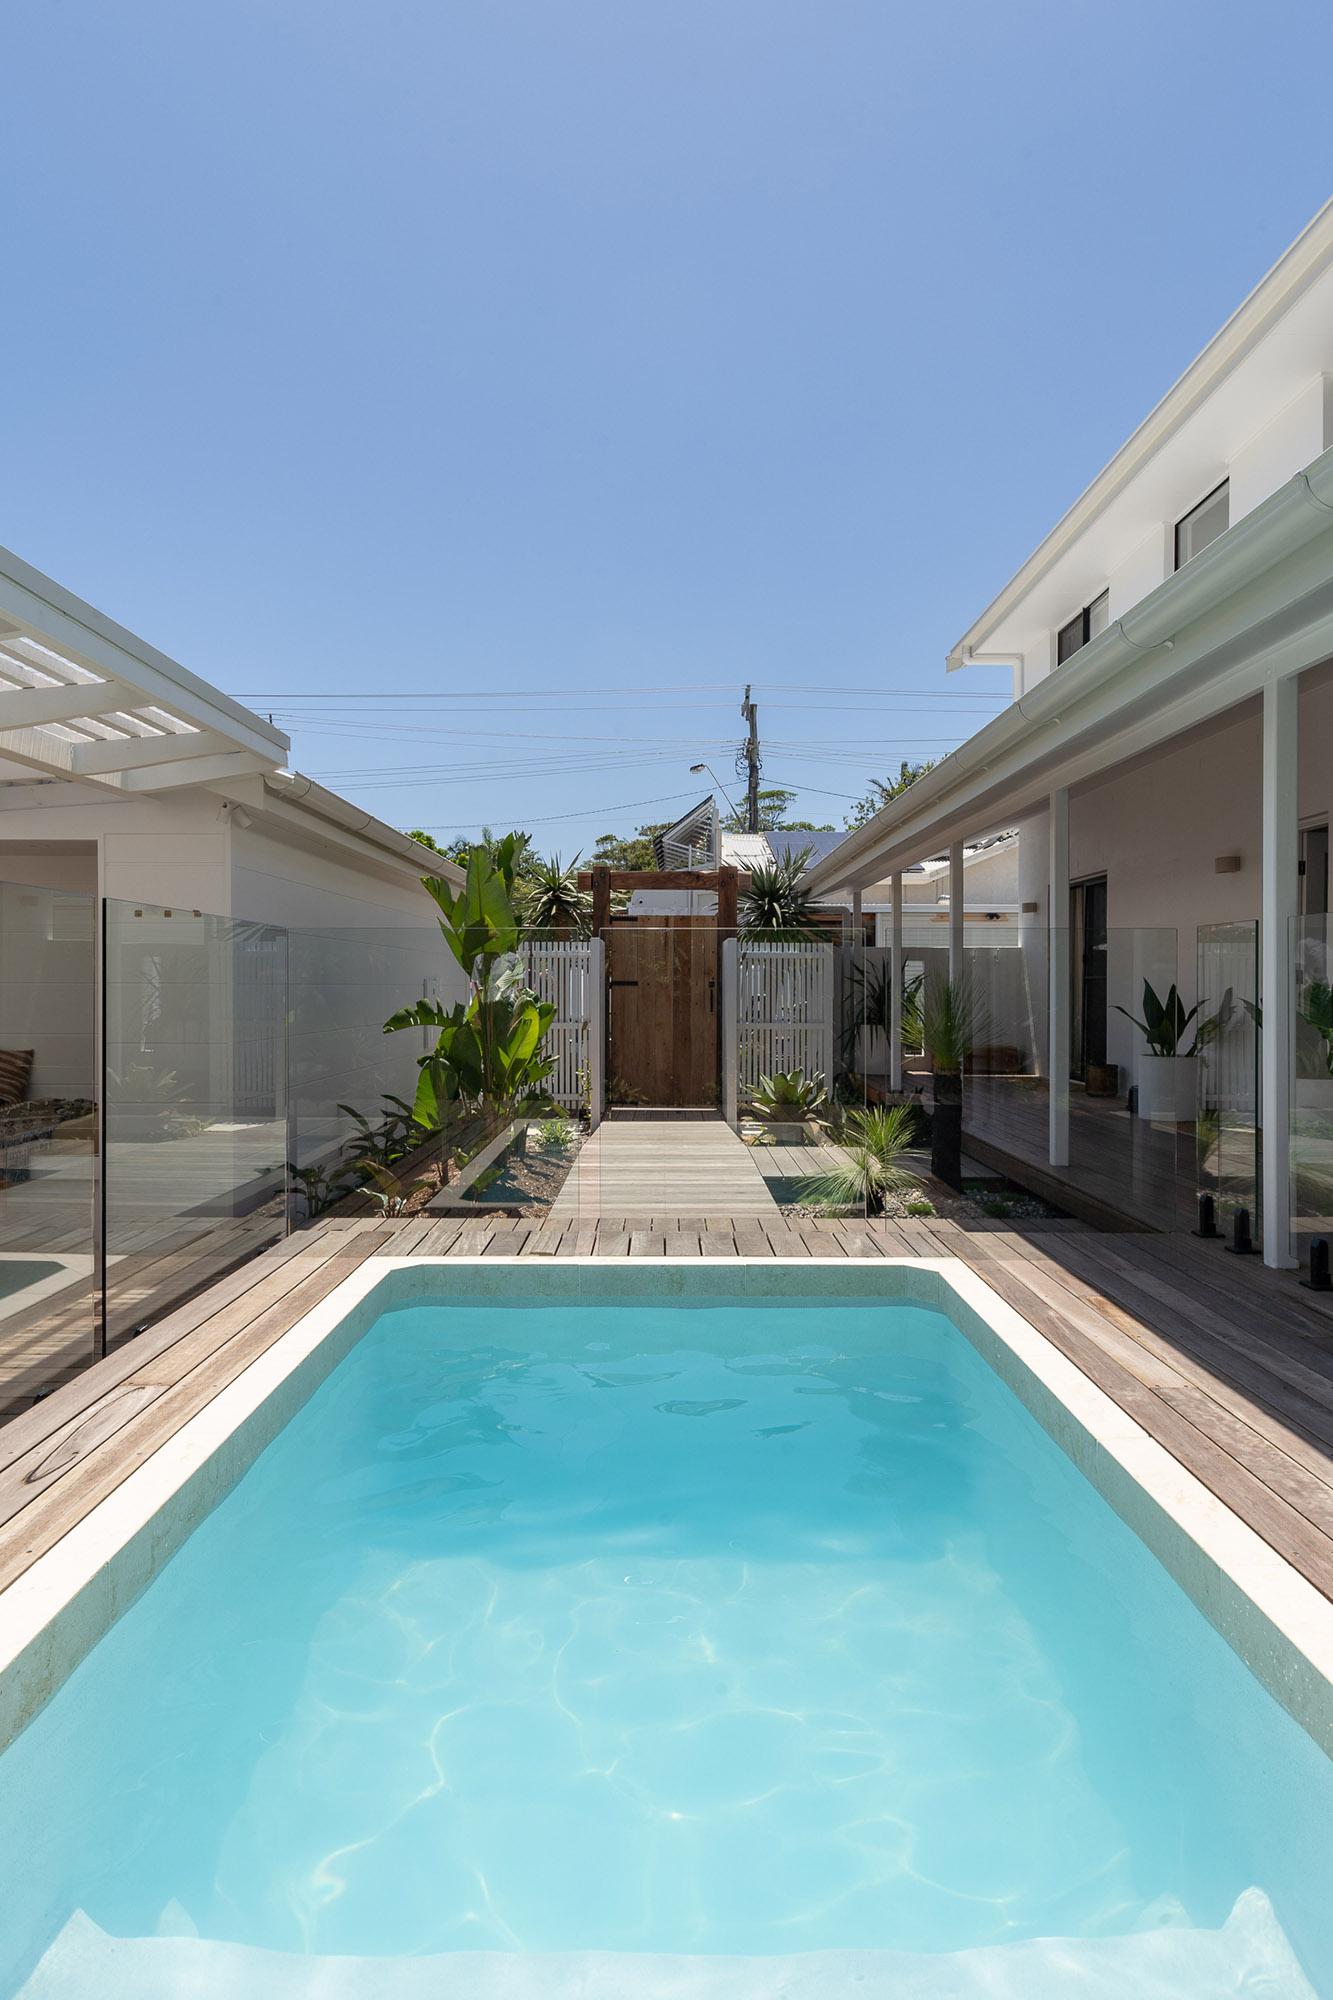 Byron Bay Villa General's 3.6m x 2.2m Plungie Studio Concrete Plunge Pool in Kona Coast